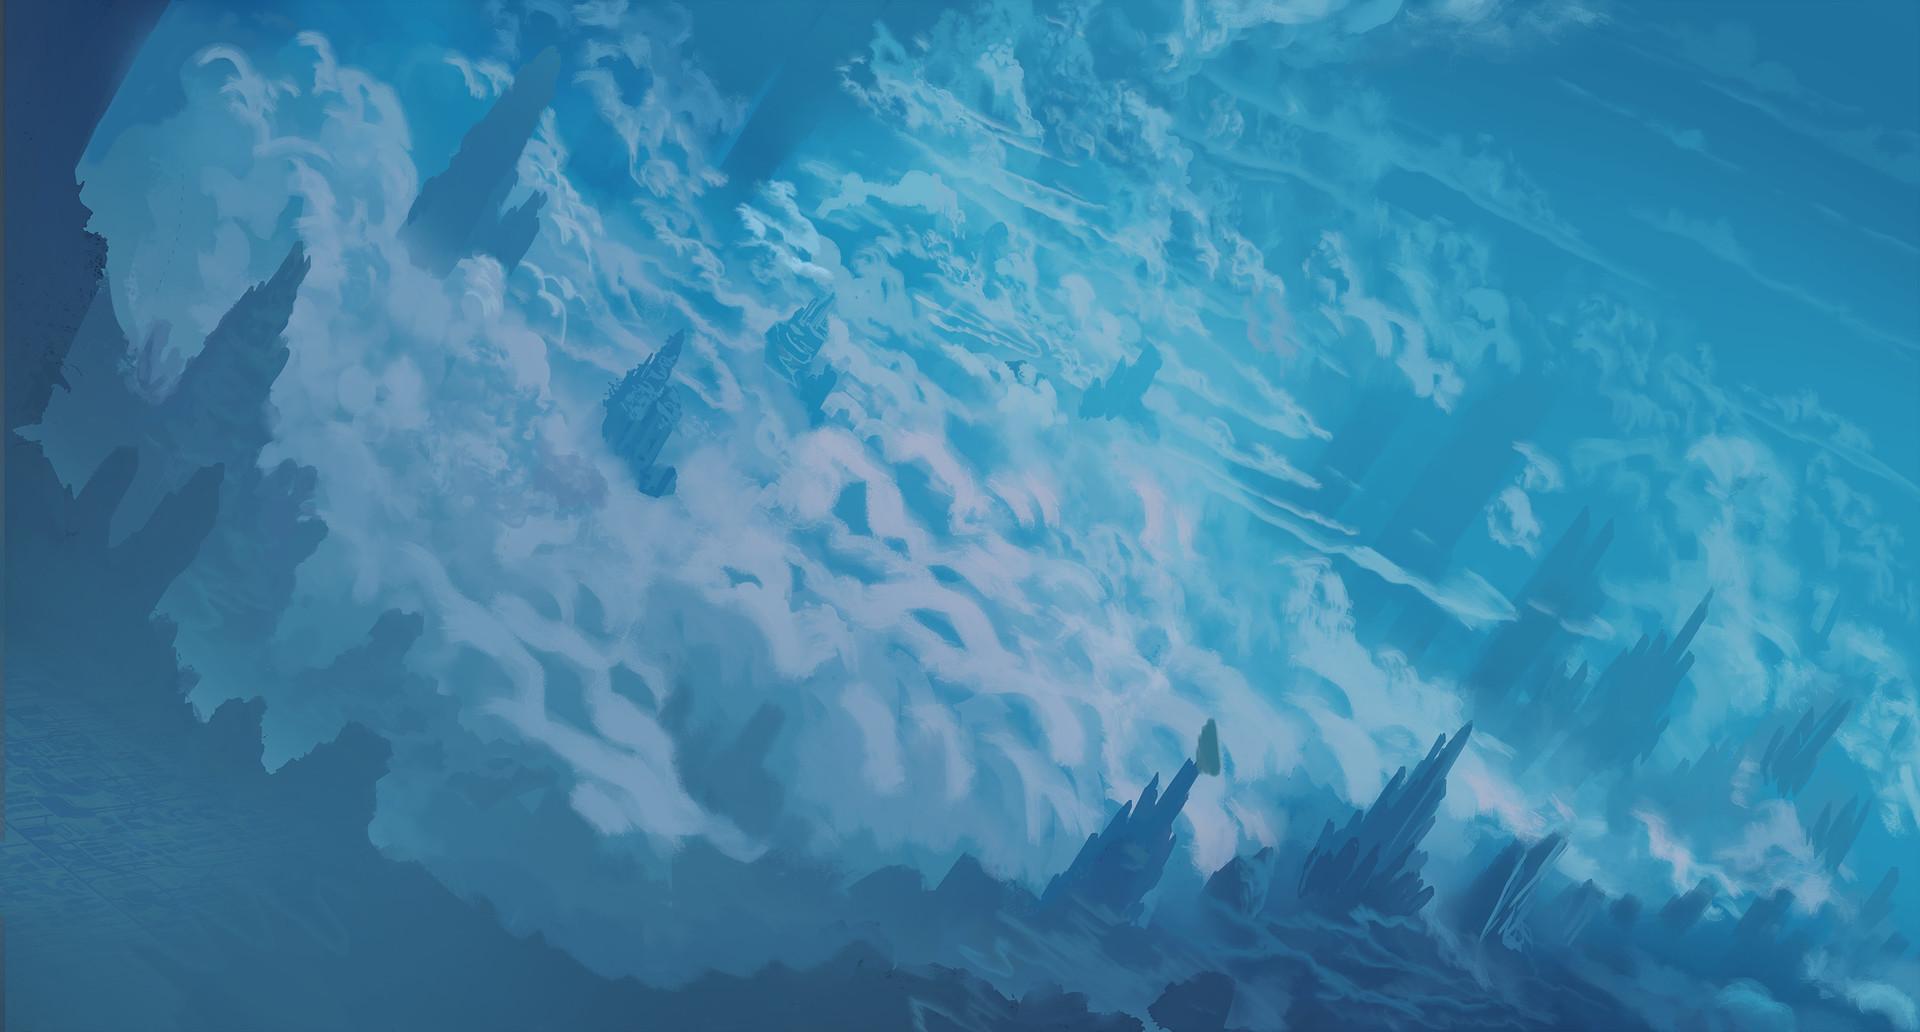 Francisco badilla floyd dragon sketch bueno 3